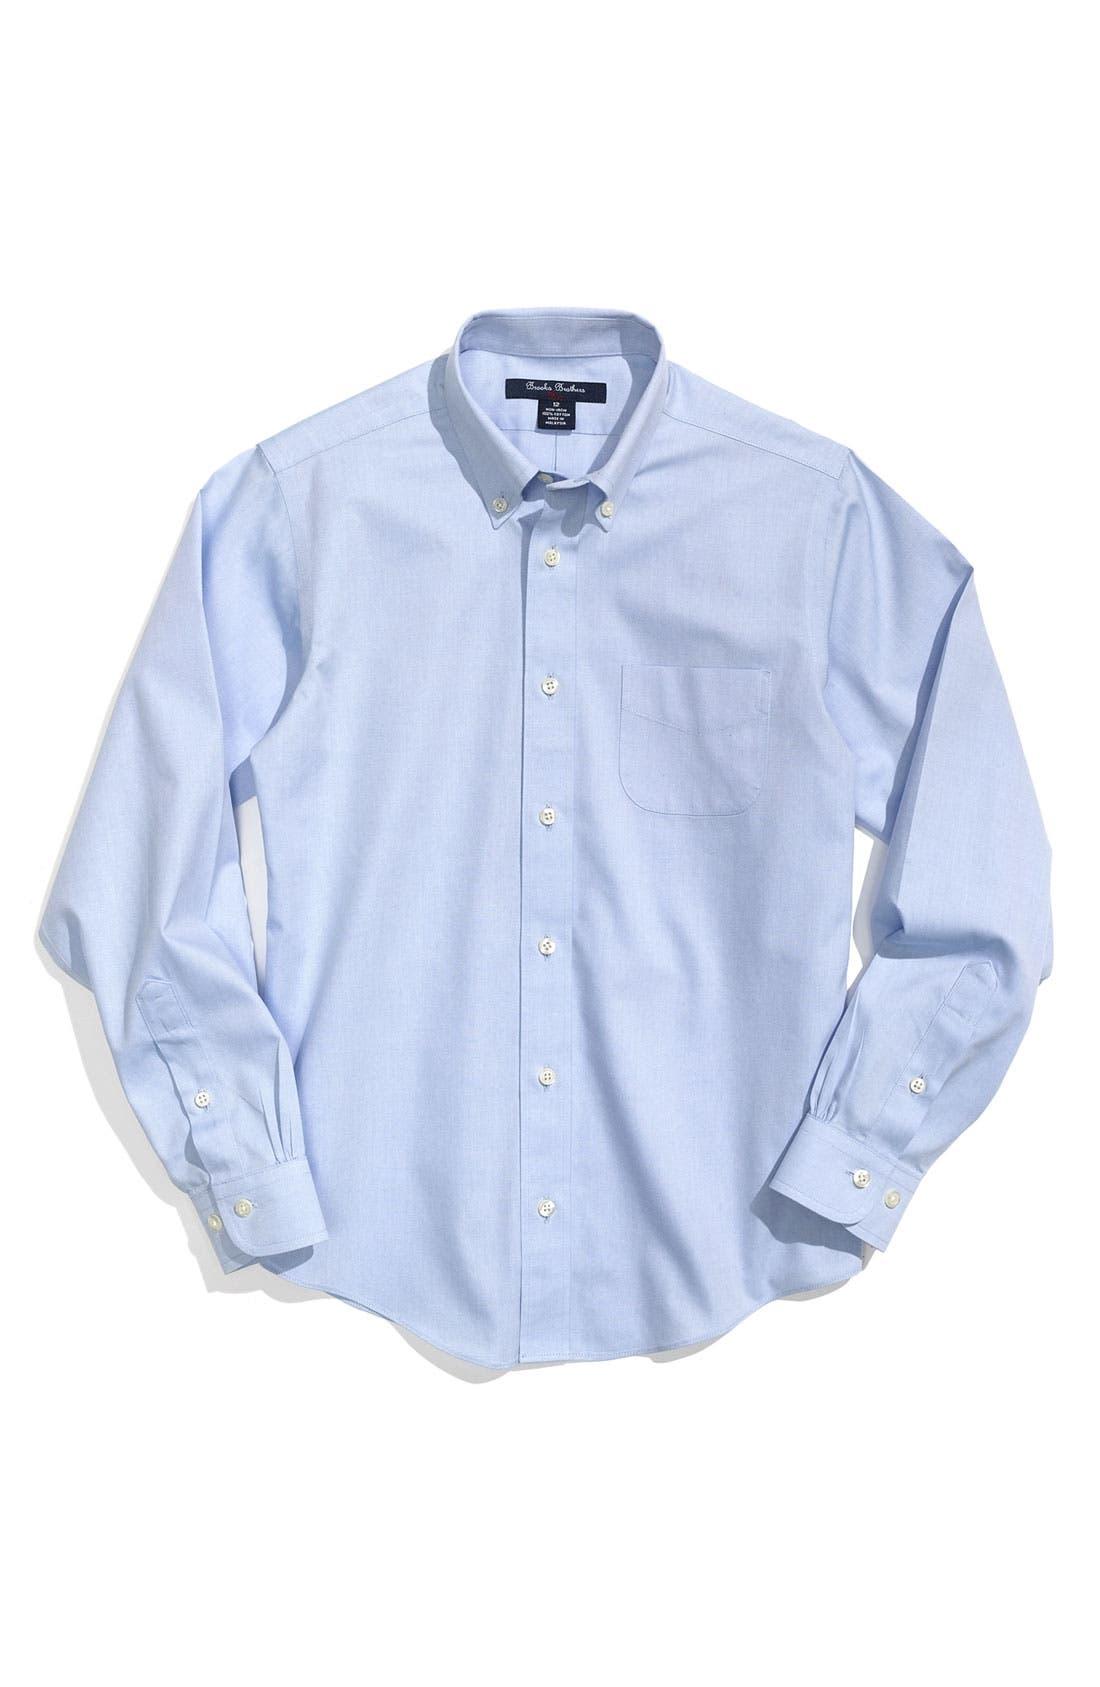 Main Image - Brooks Brothers Dress Shirt (Big Boys)